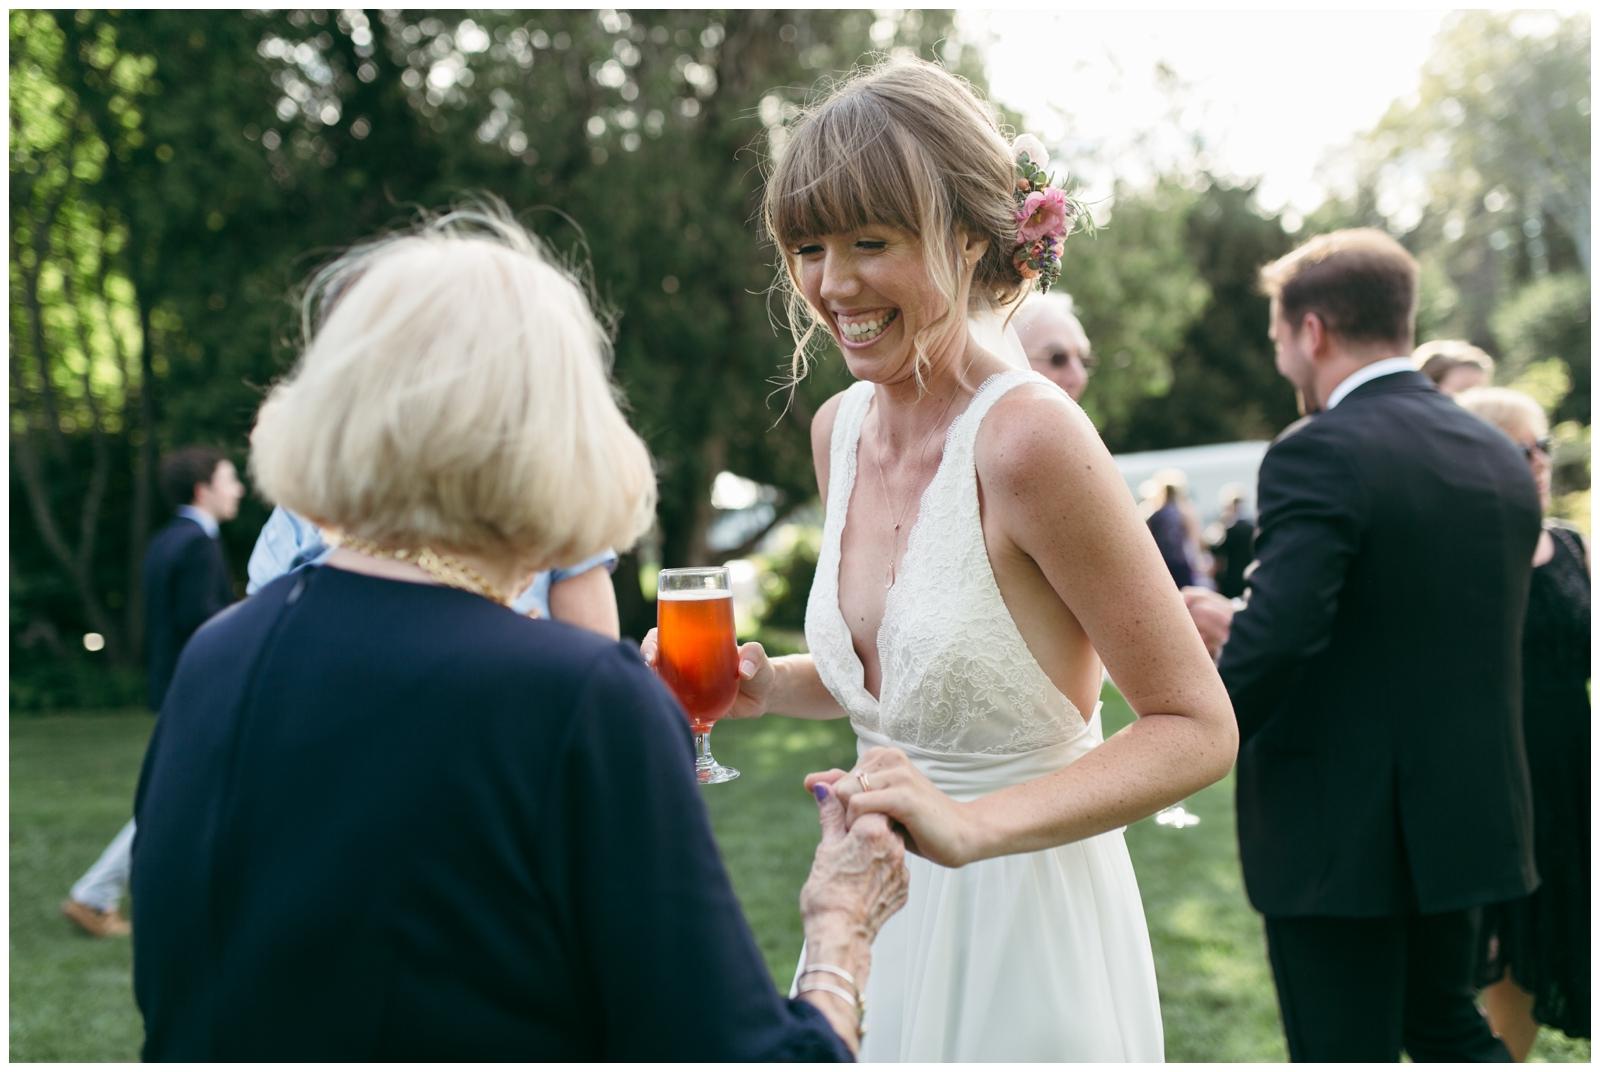 Moraine-Farm-wedding-Bailey-Q-Photo-Massachusetts-wedding-photpgrapher-083.jpg